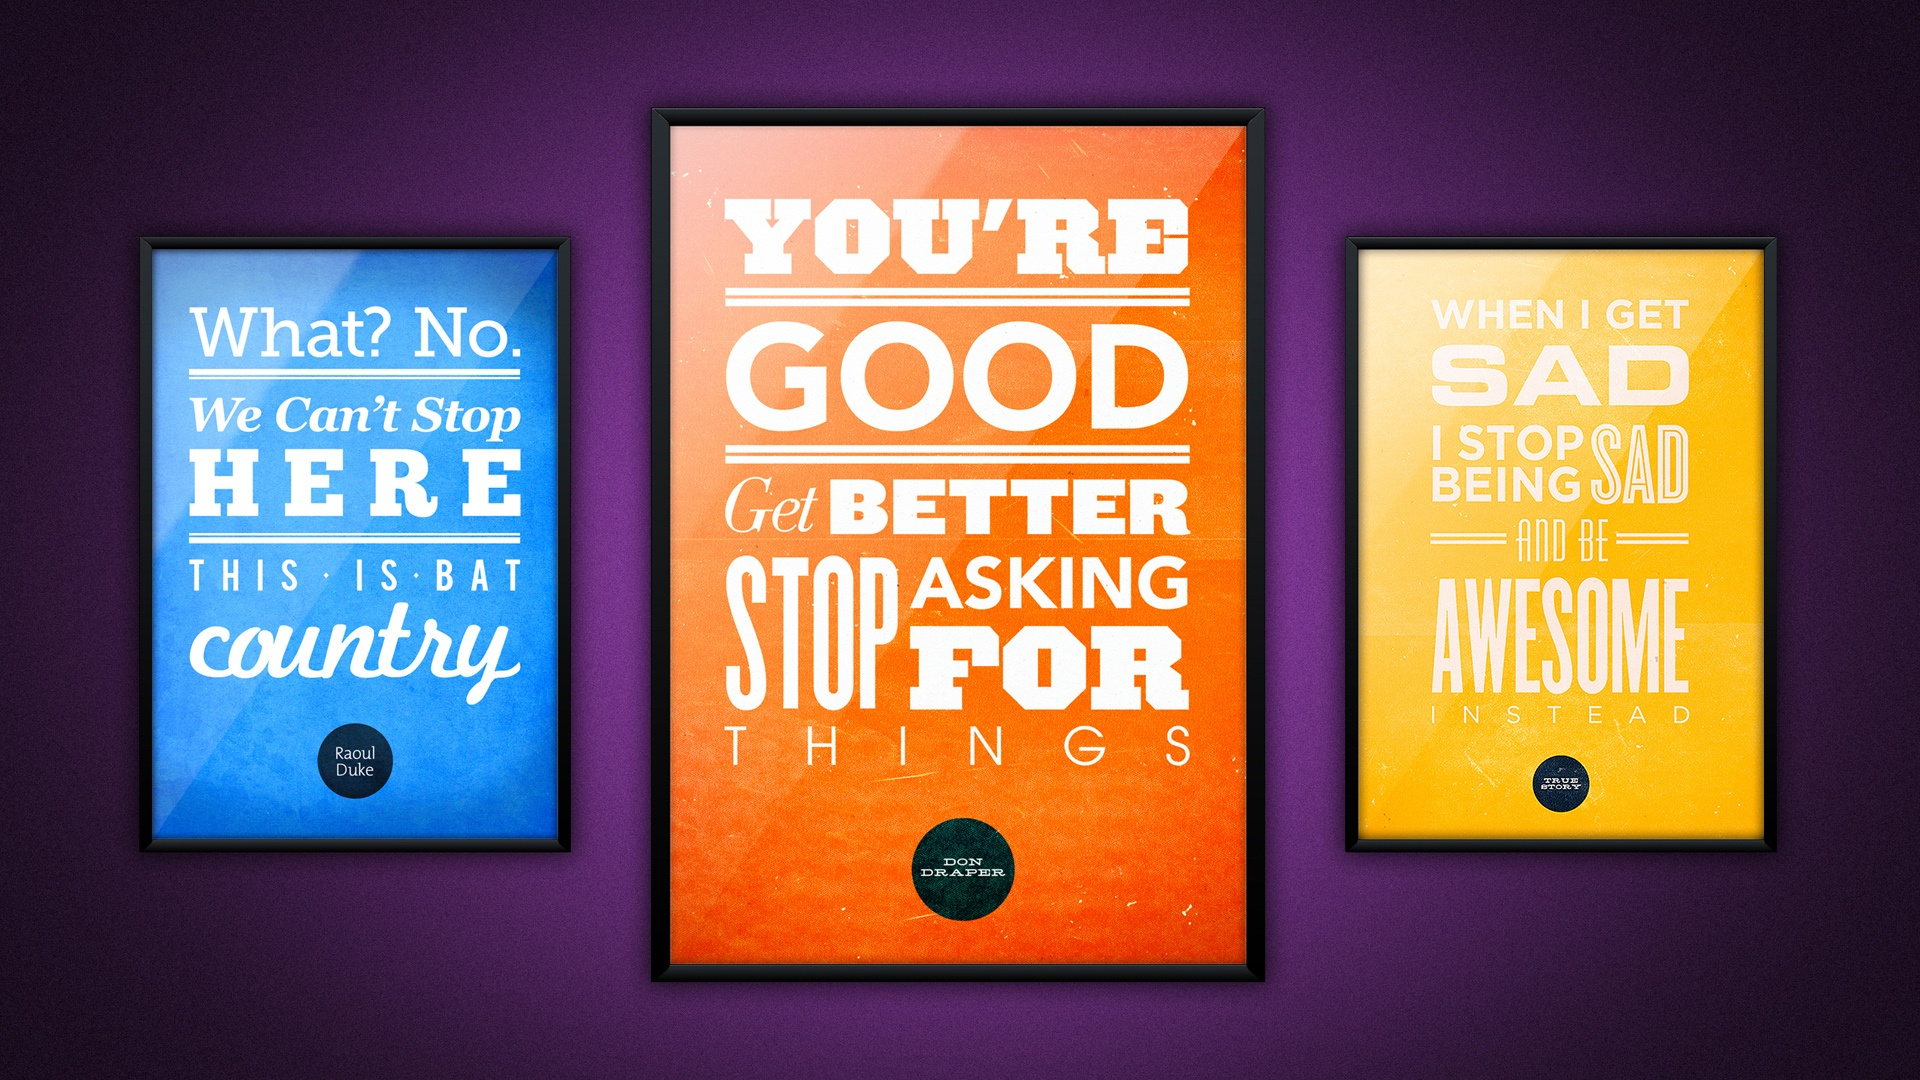 Disney Quote Desktop Backgrounds Desktop backgrounds quotes 1920x1080